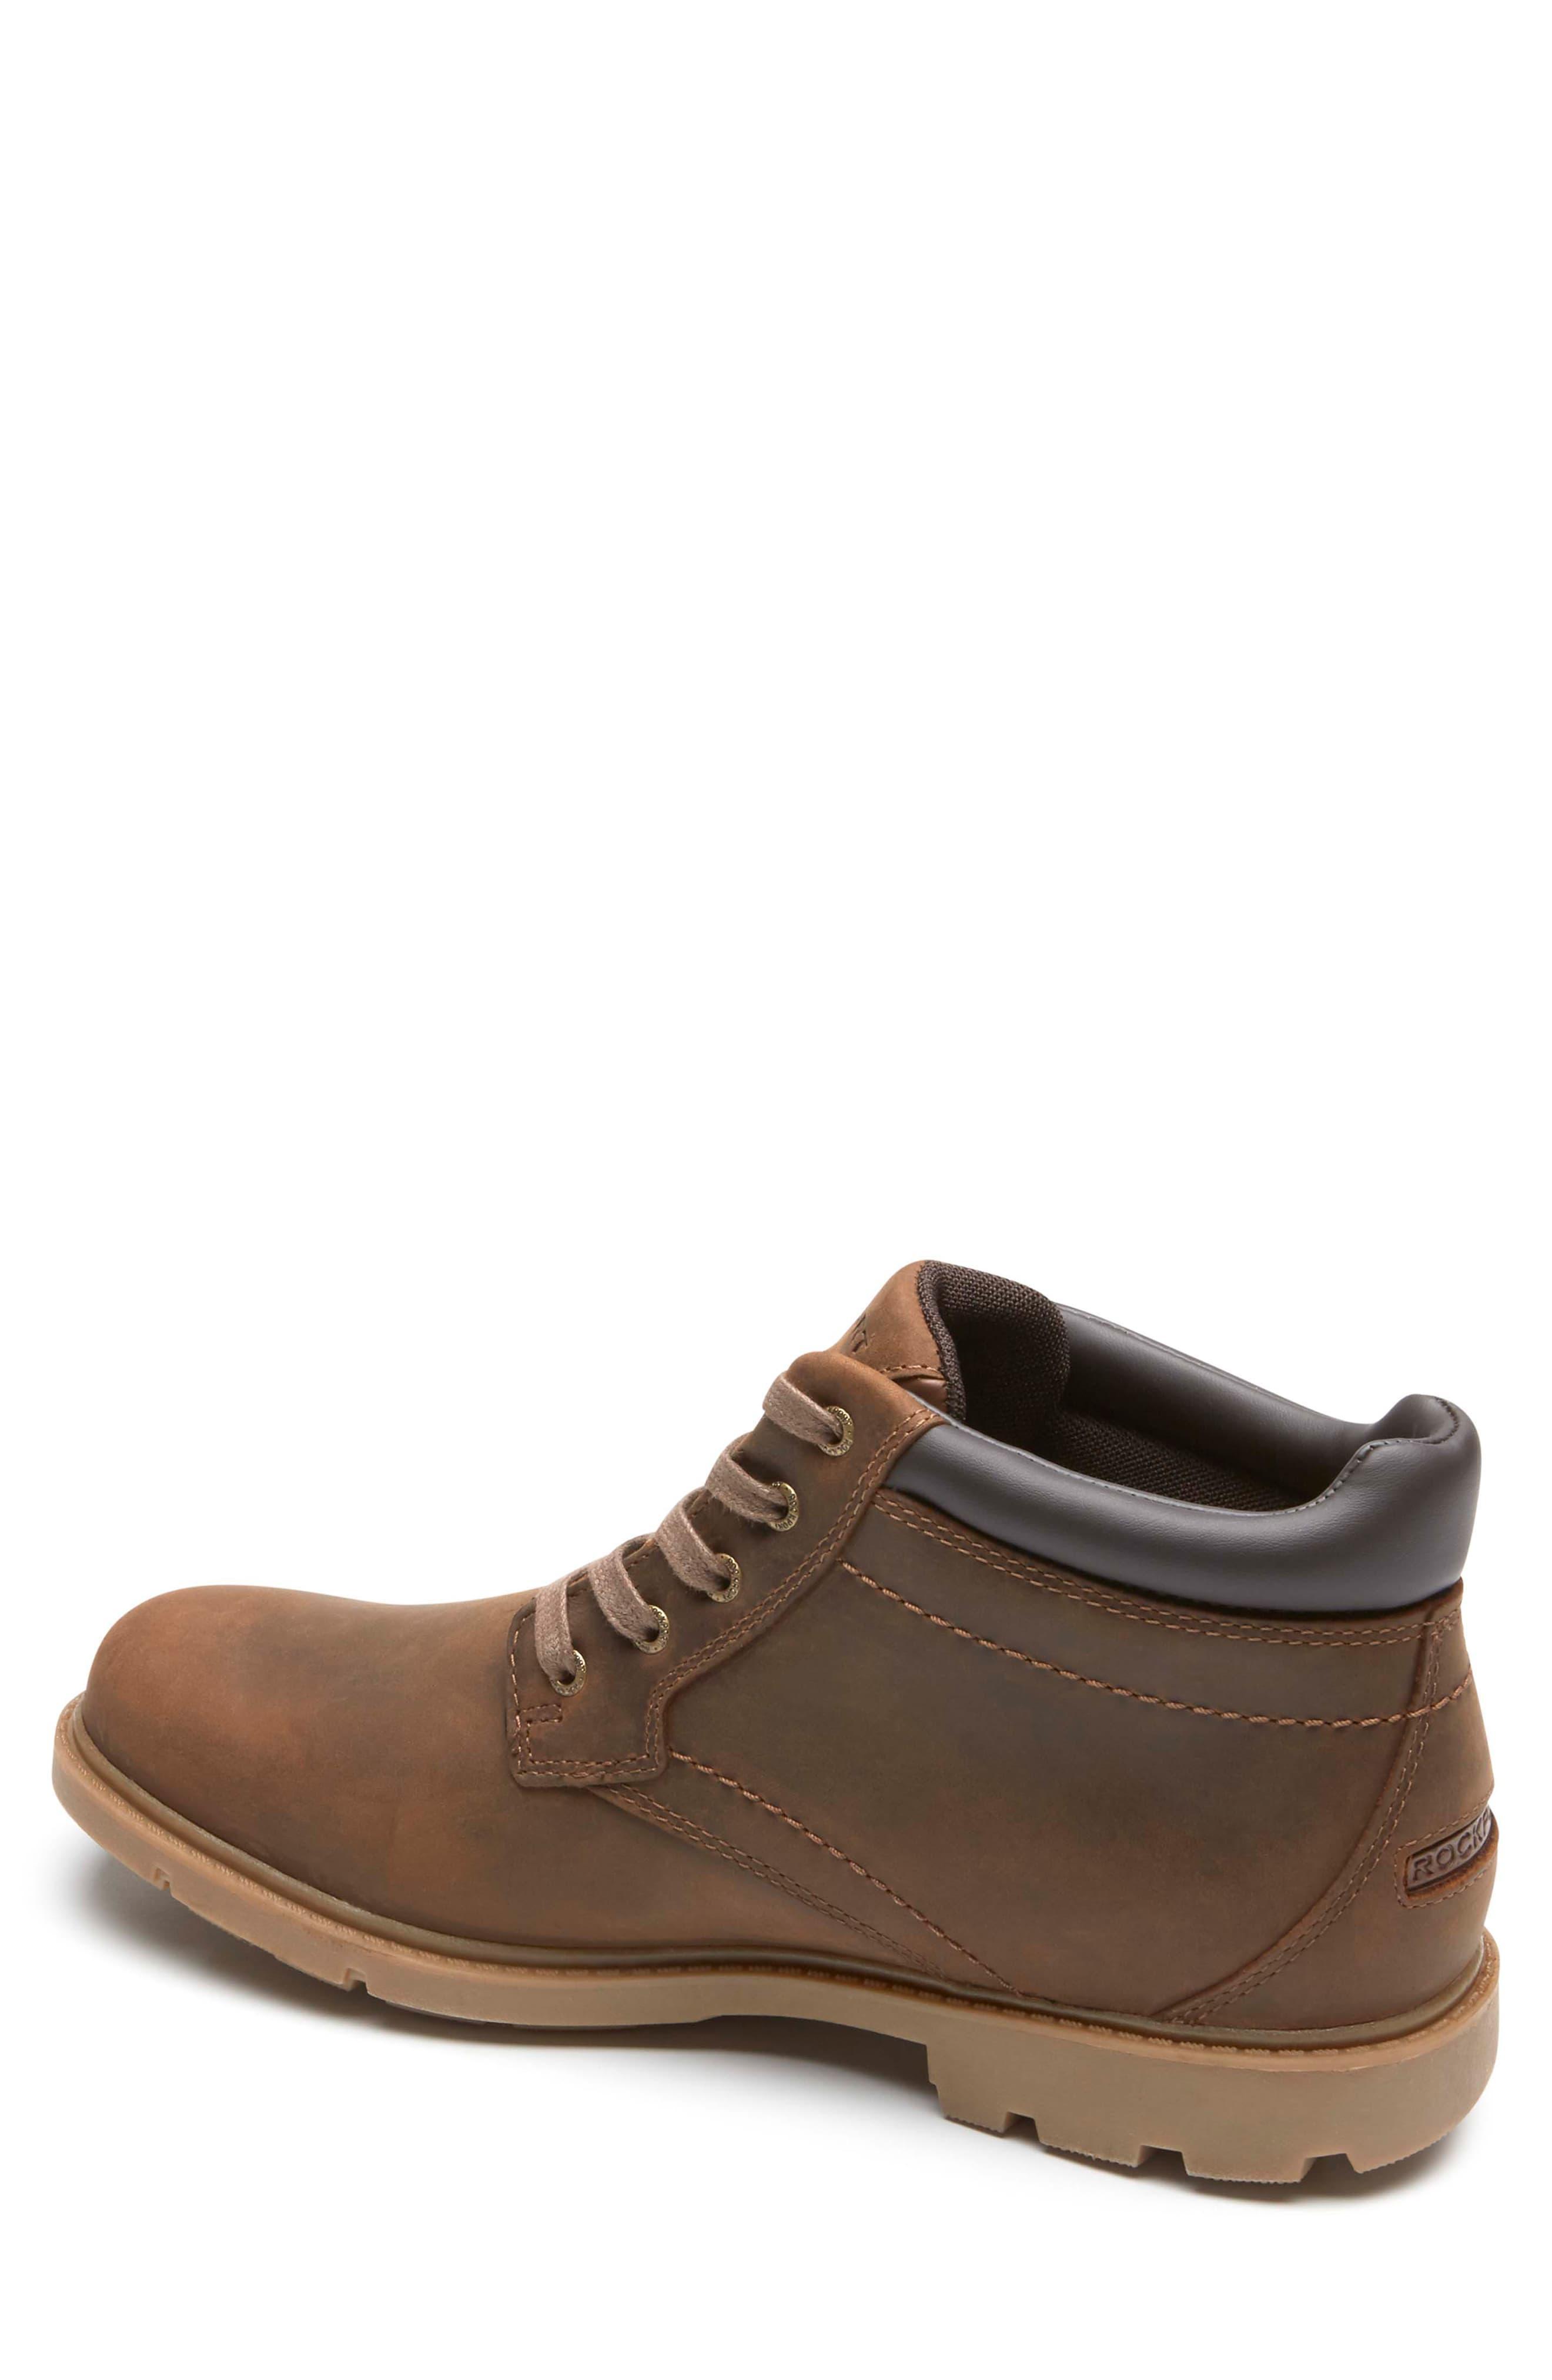 d5a6bdc51b7 Rockport Brown Boston Waterproof Boot for men